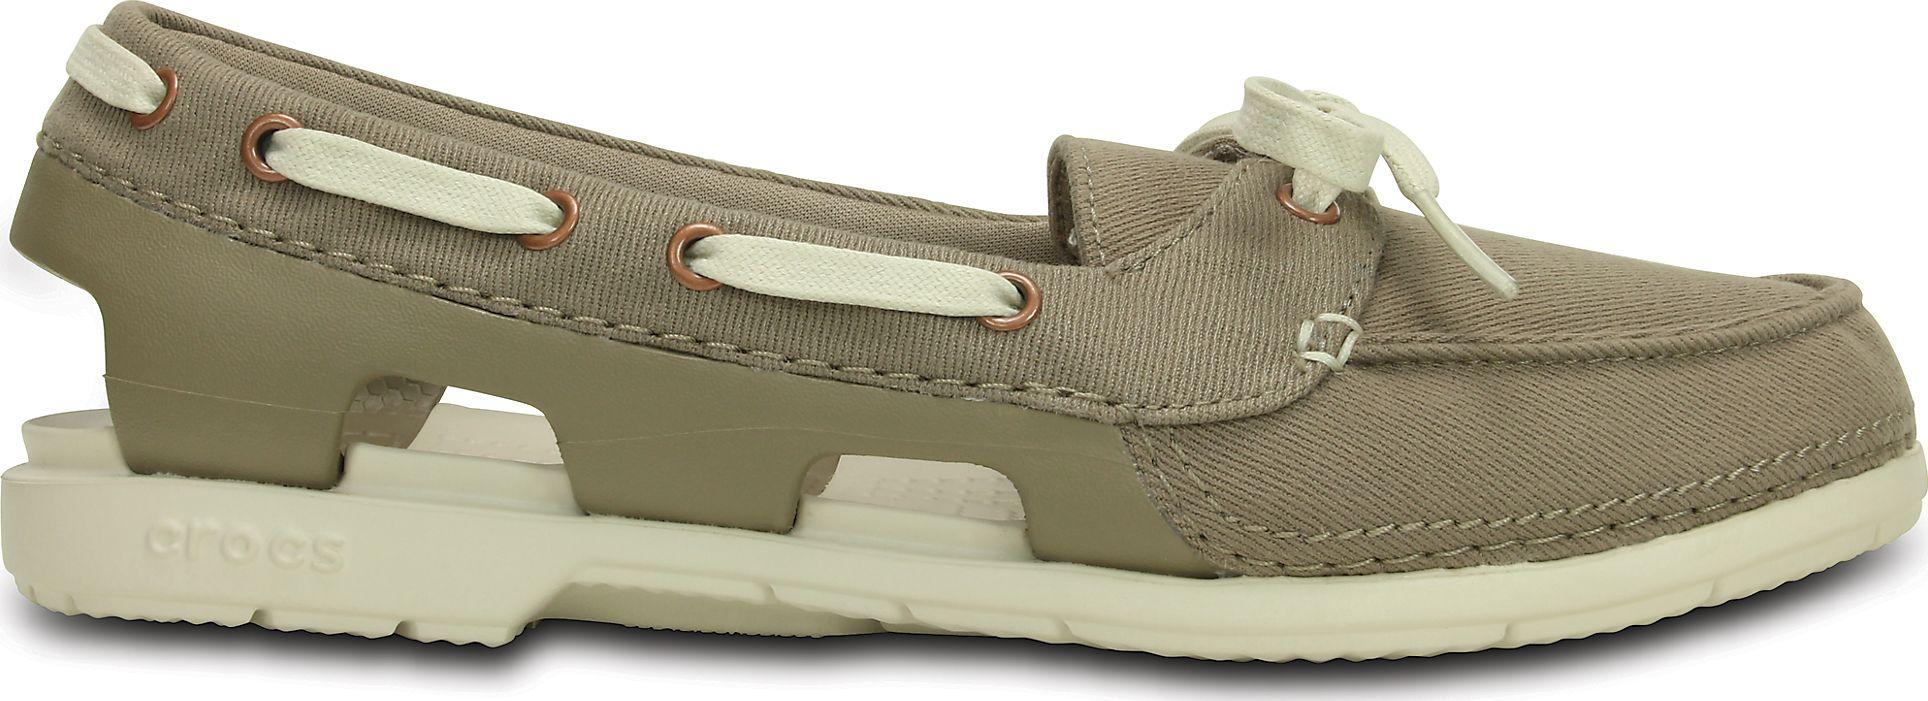 Crocs™ Beach Line Hybrid Boat Shoe Khaki/Stucco ...